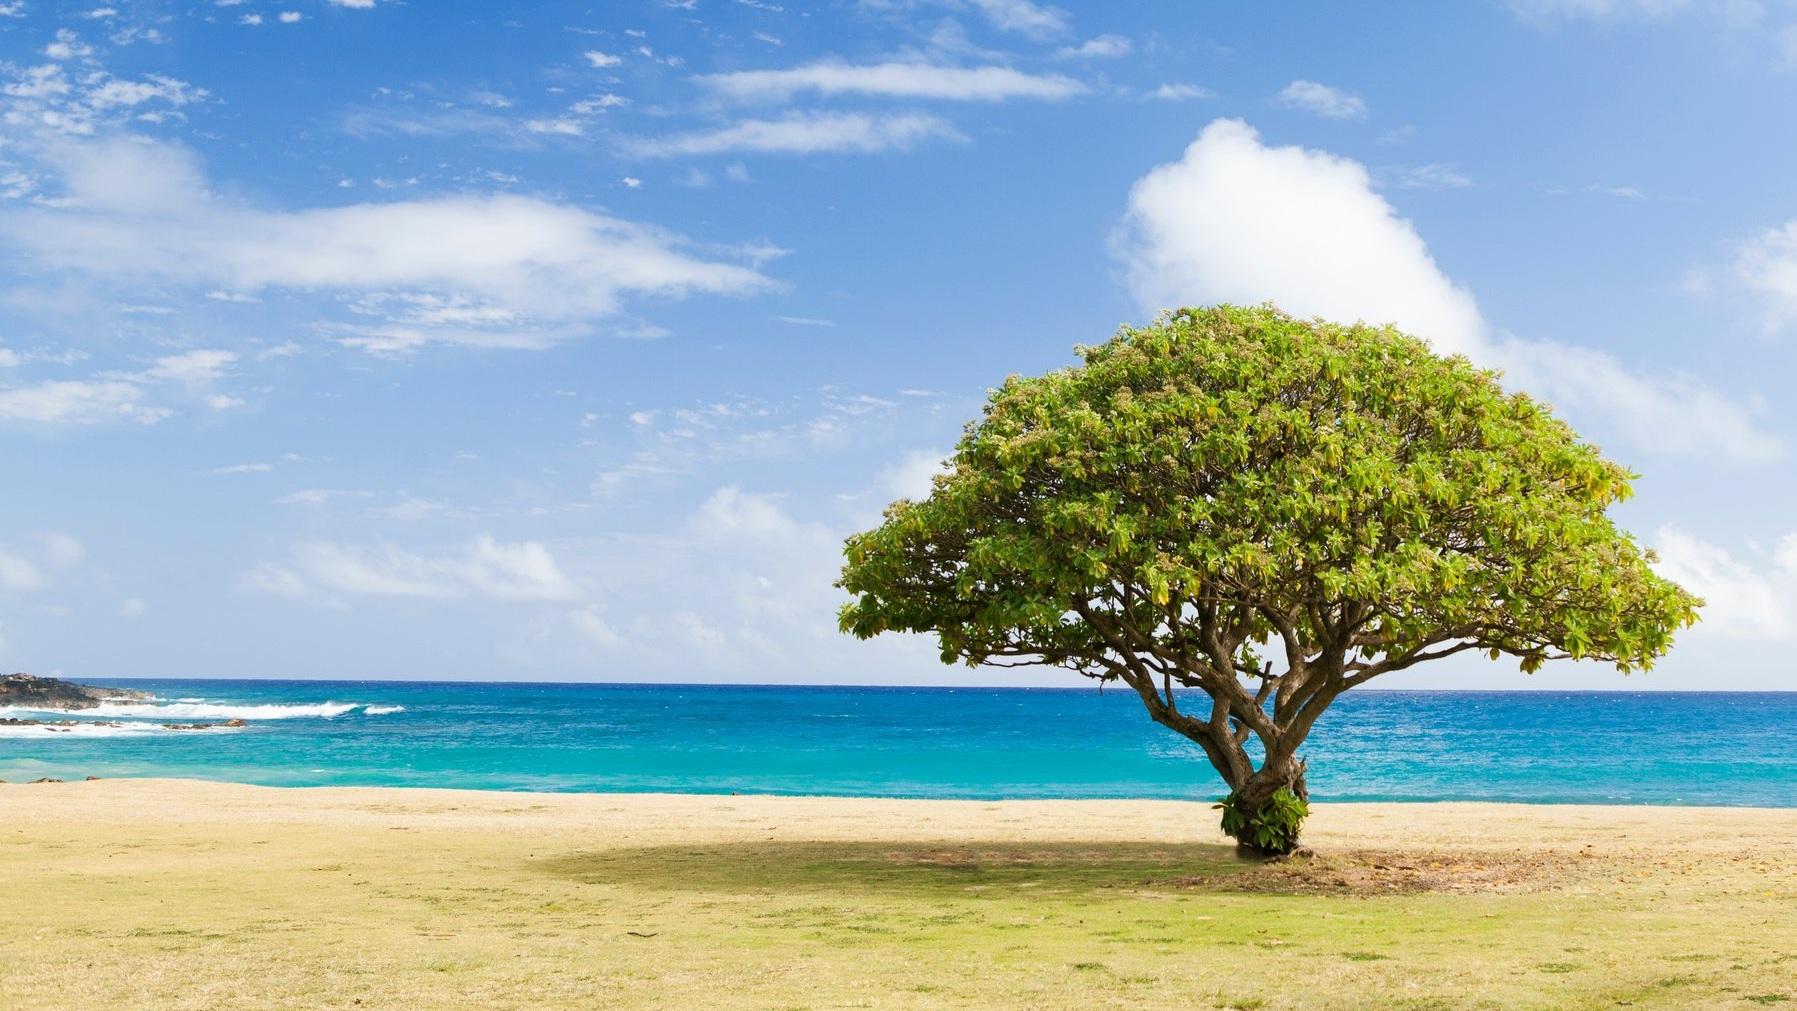 peaceful-beach-todd-quackenbush-77495-unsplash.jpg